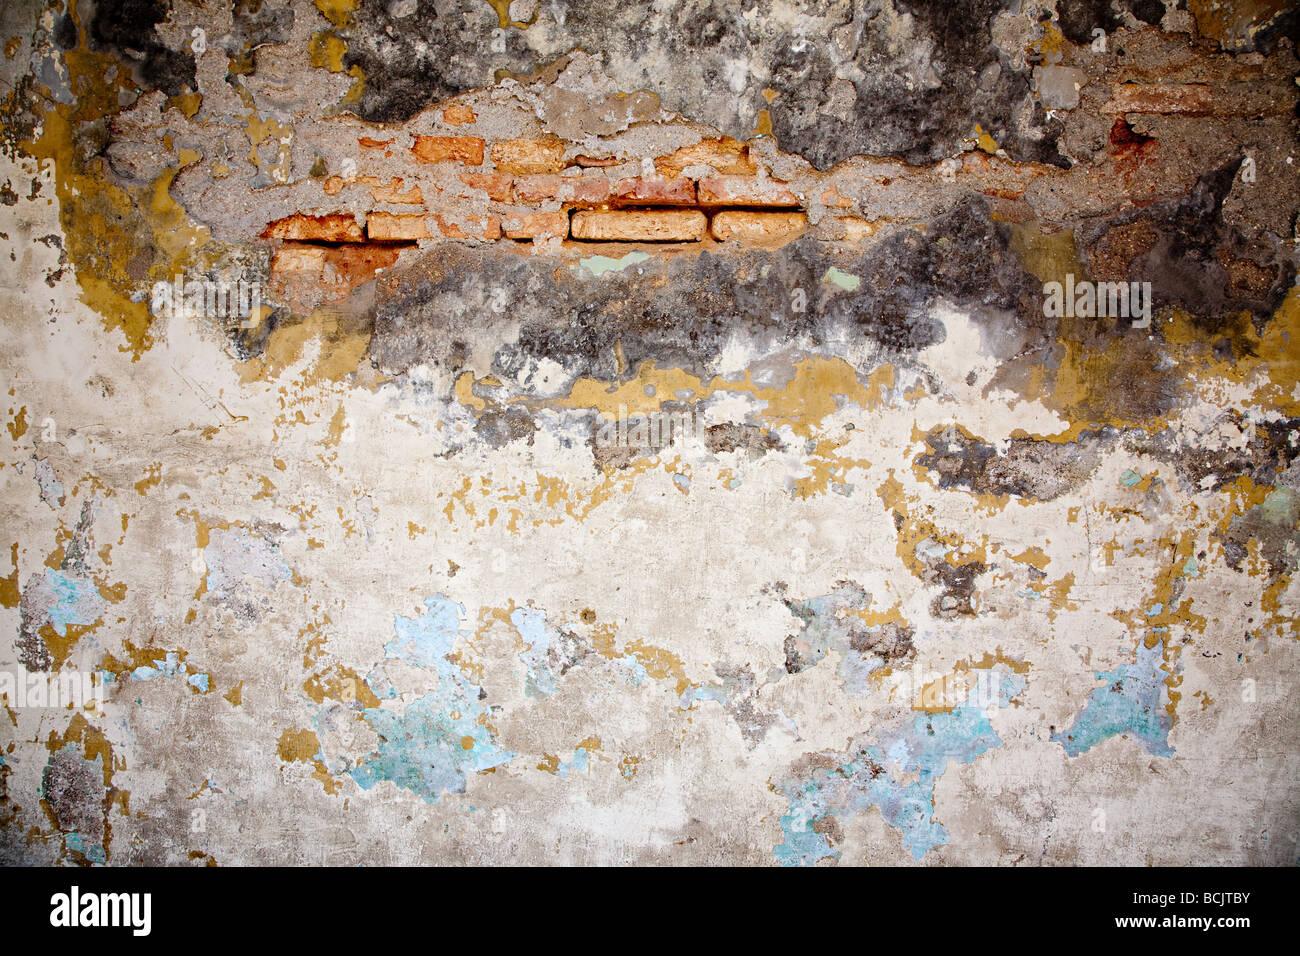 A damaged wall - Stock Image